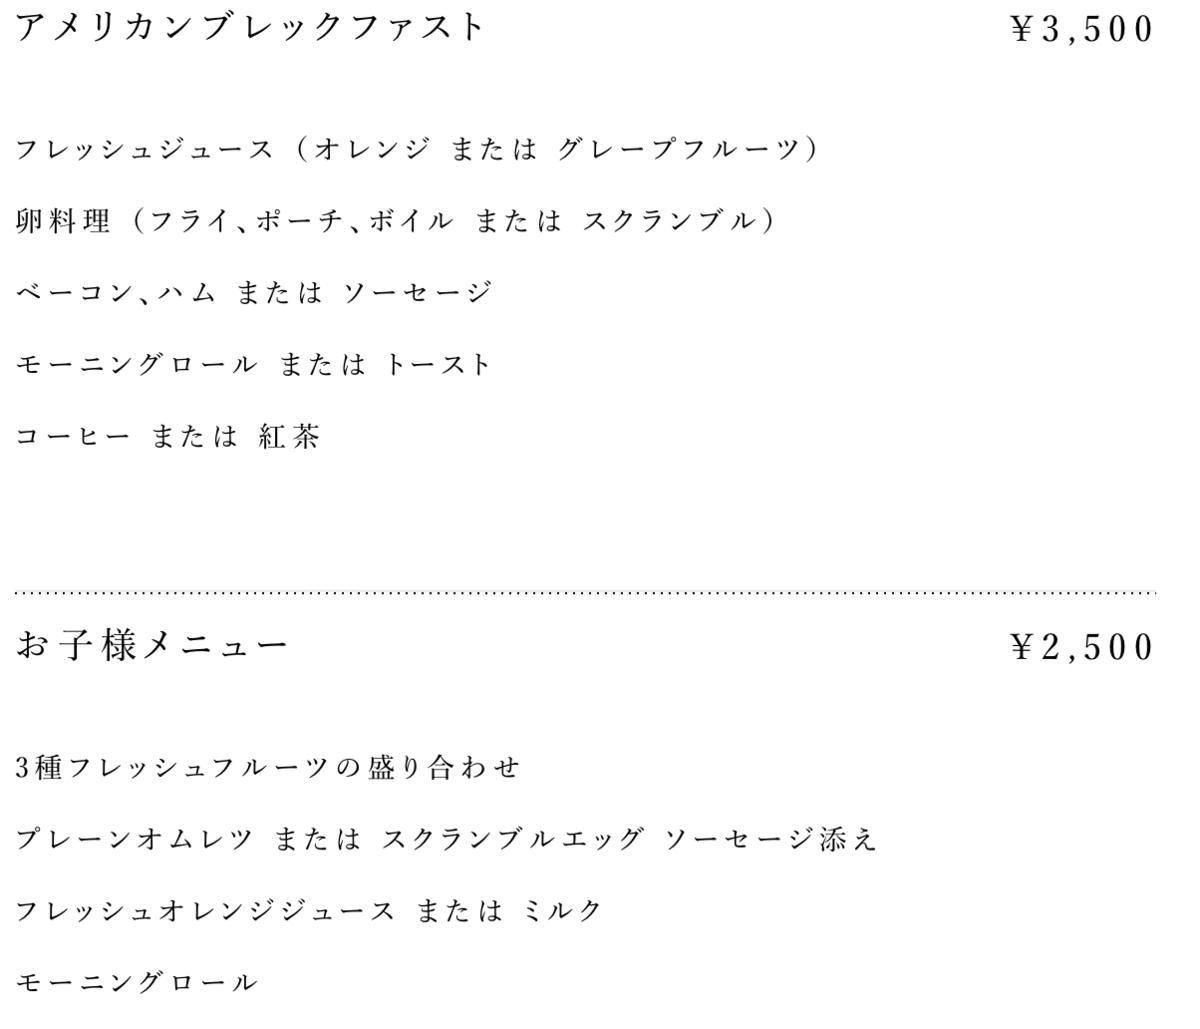 f:id:great_journey:20210101224935p:plain